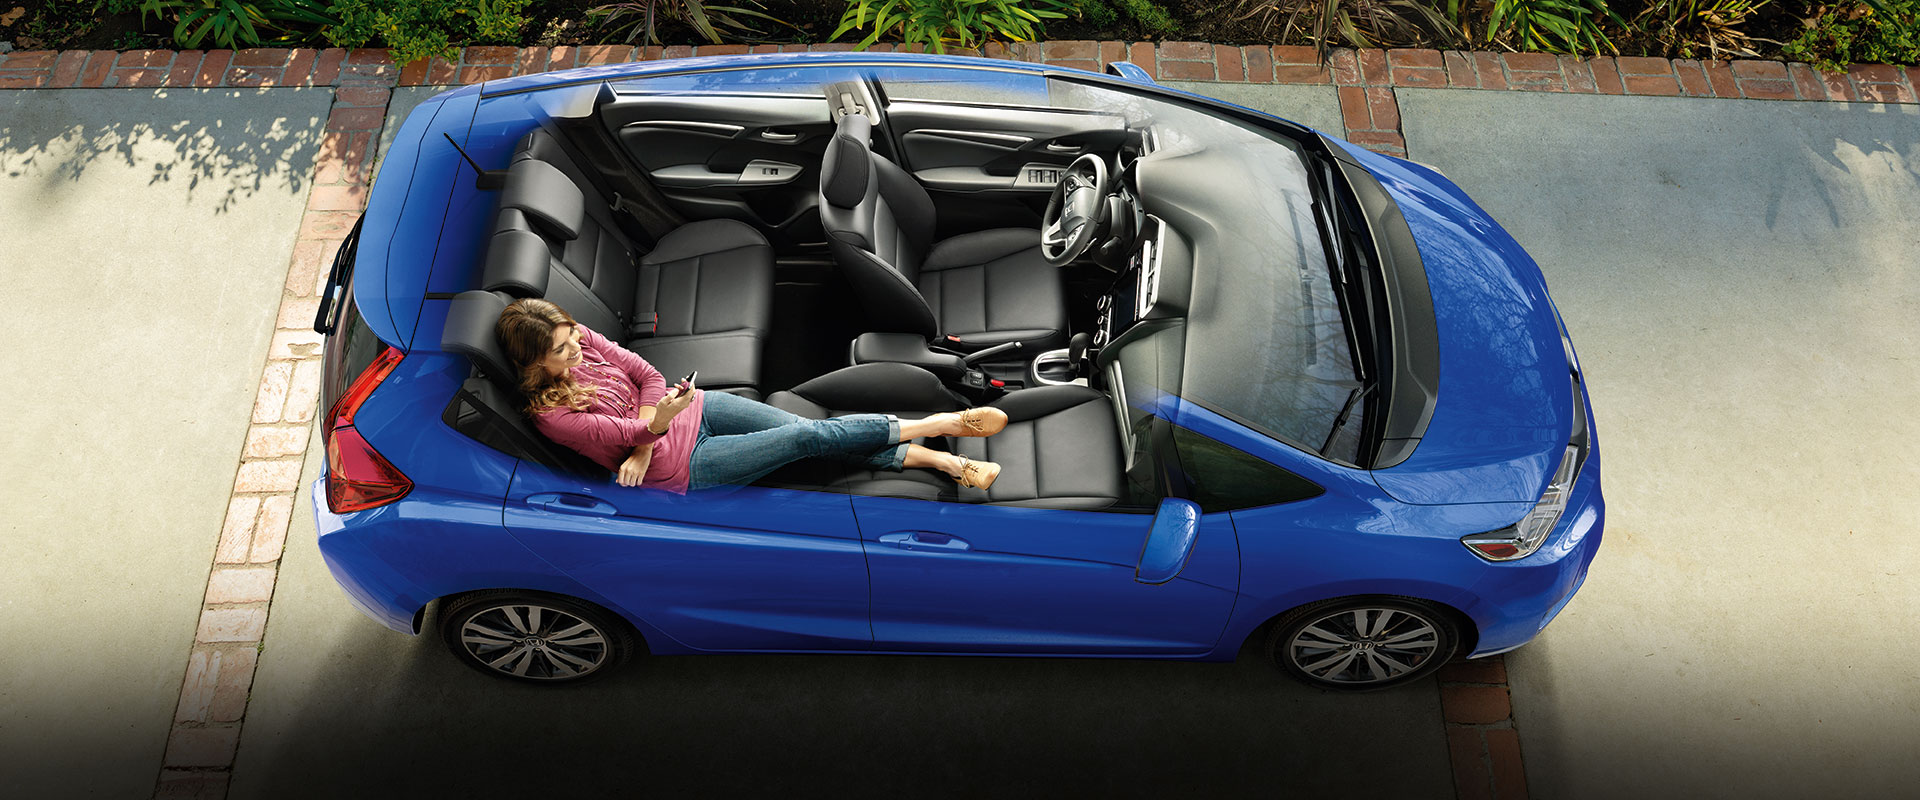 Automobiles Honda Com Images 2016 Fit Features Interior